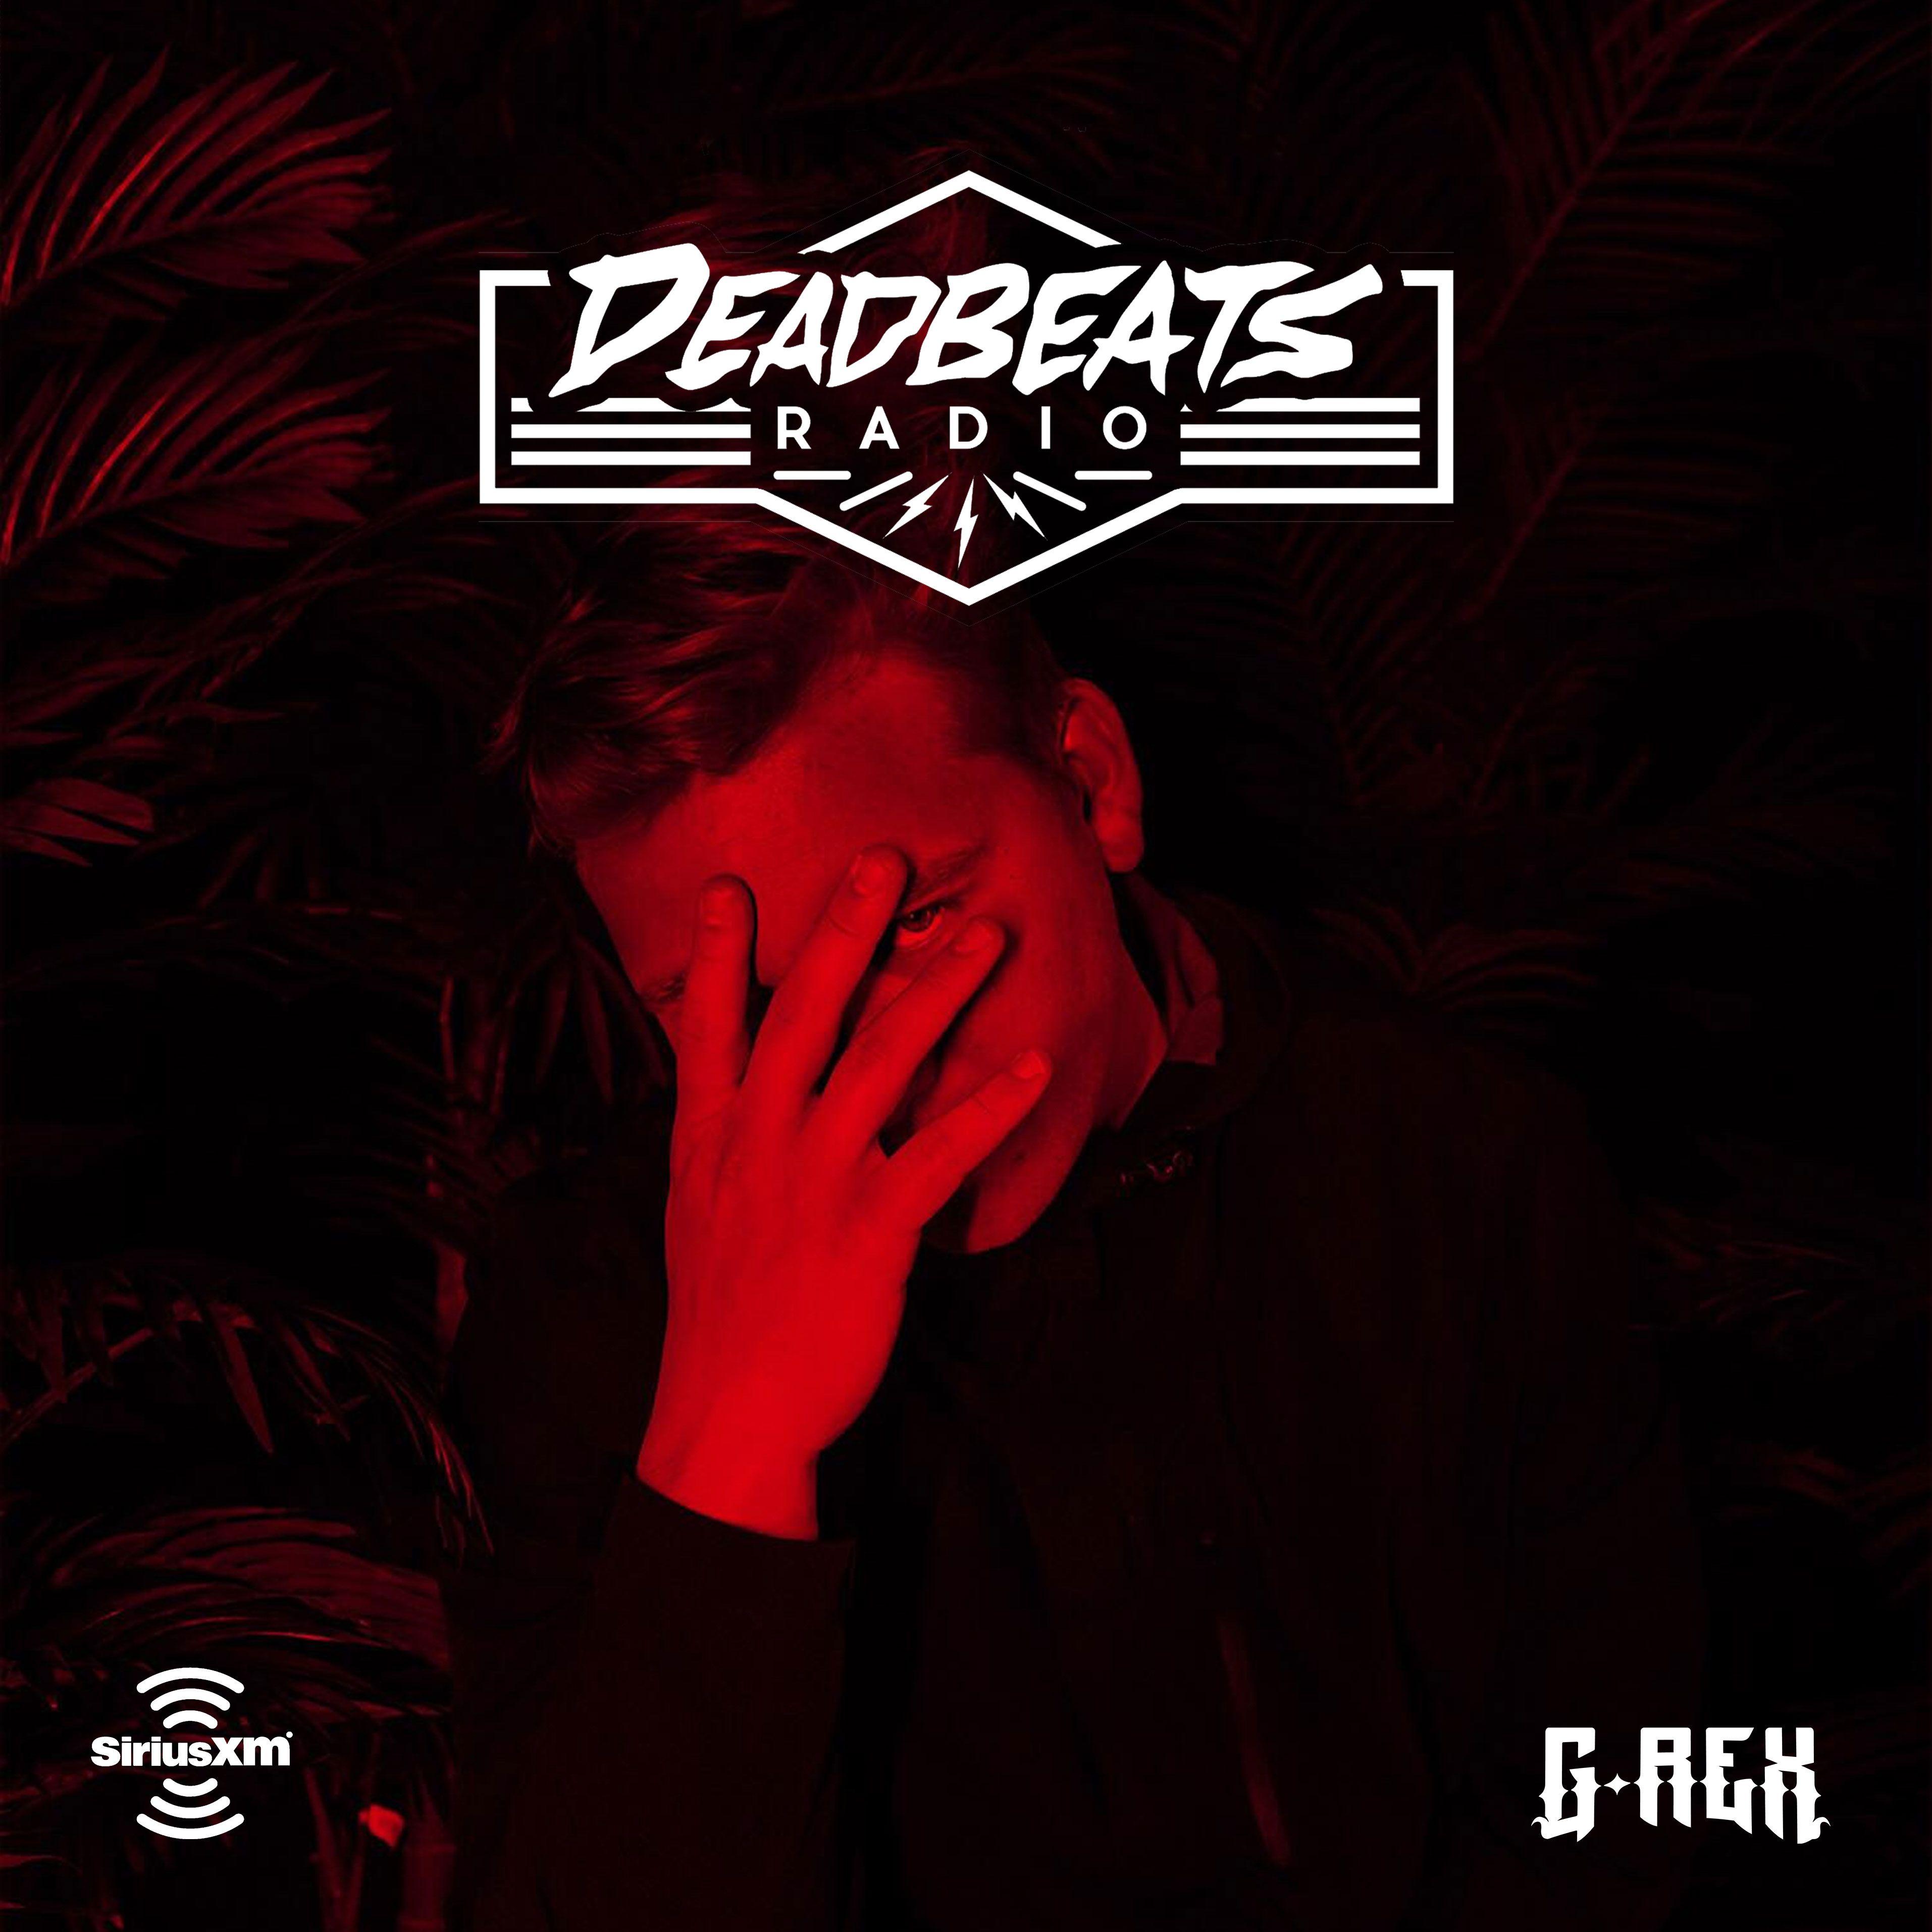 Best Episodes of Deadbeats Radio with Zeds Dead